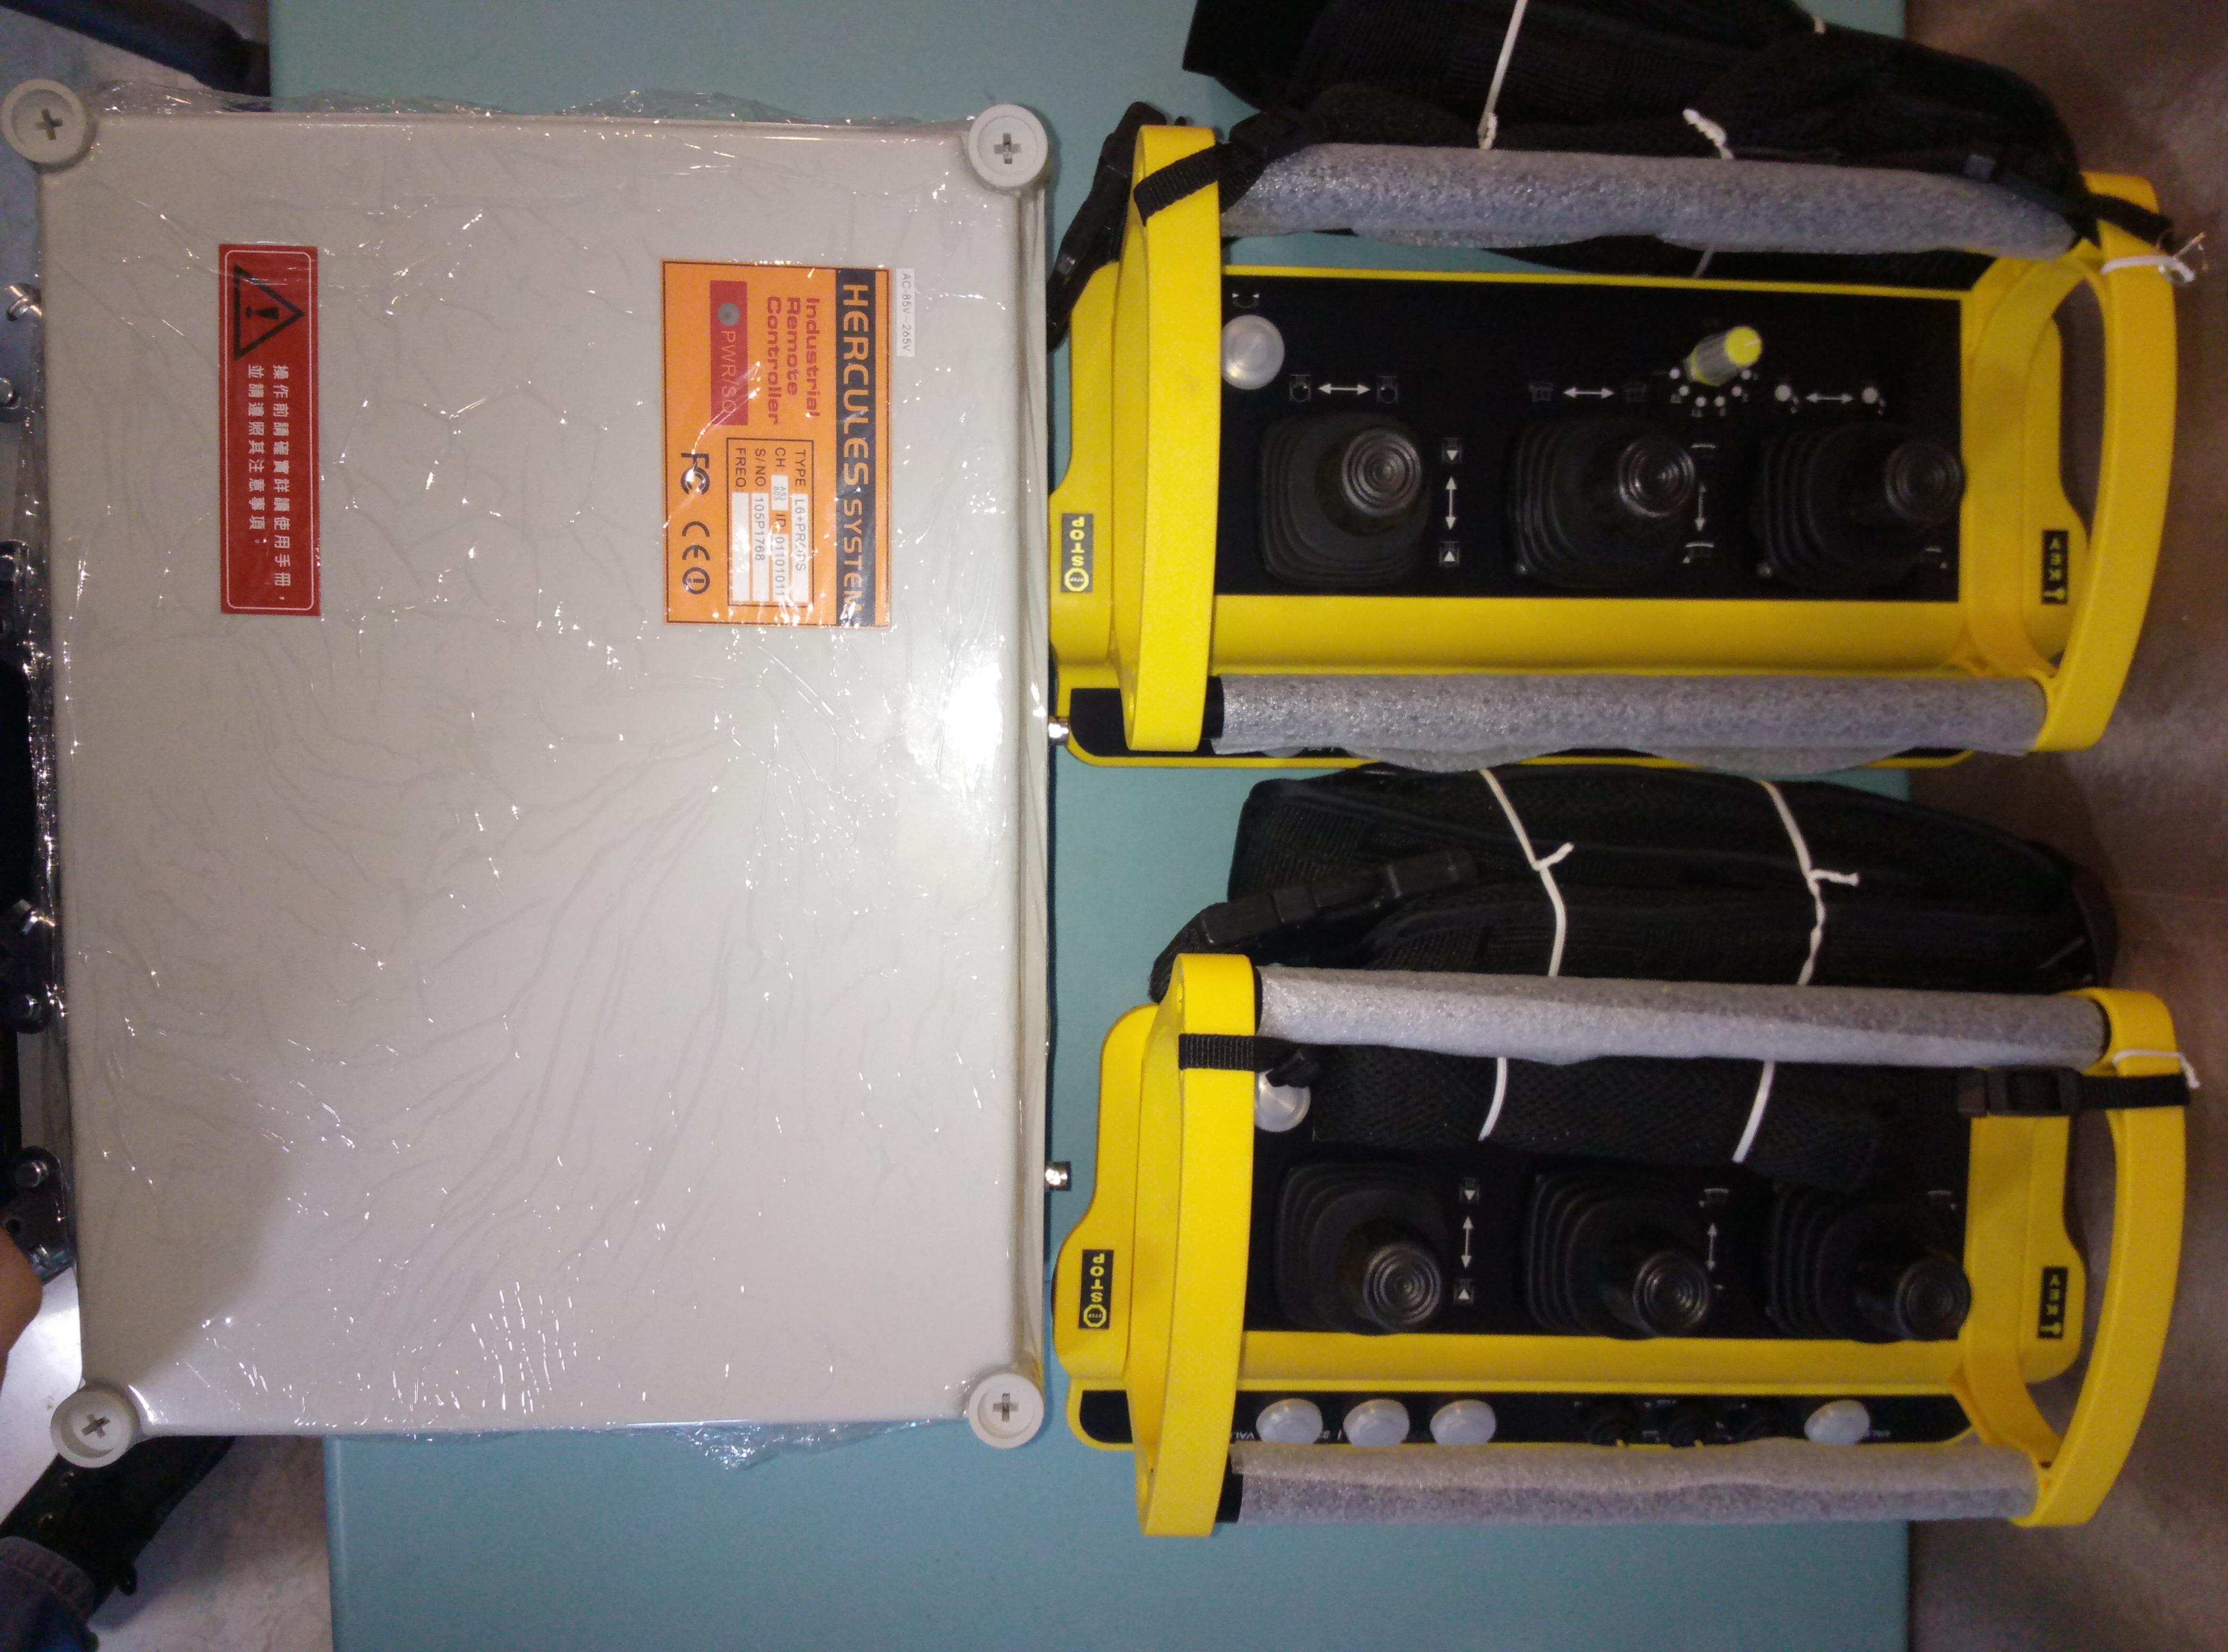 HERCULES L3-P5无线遥控器大力神L系列工业无线遥控器